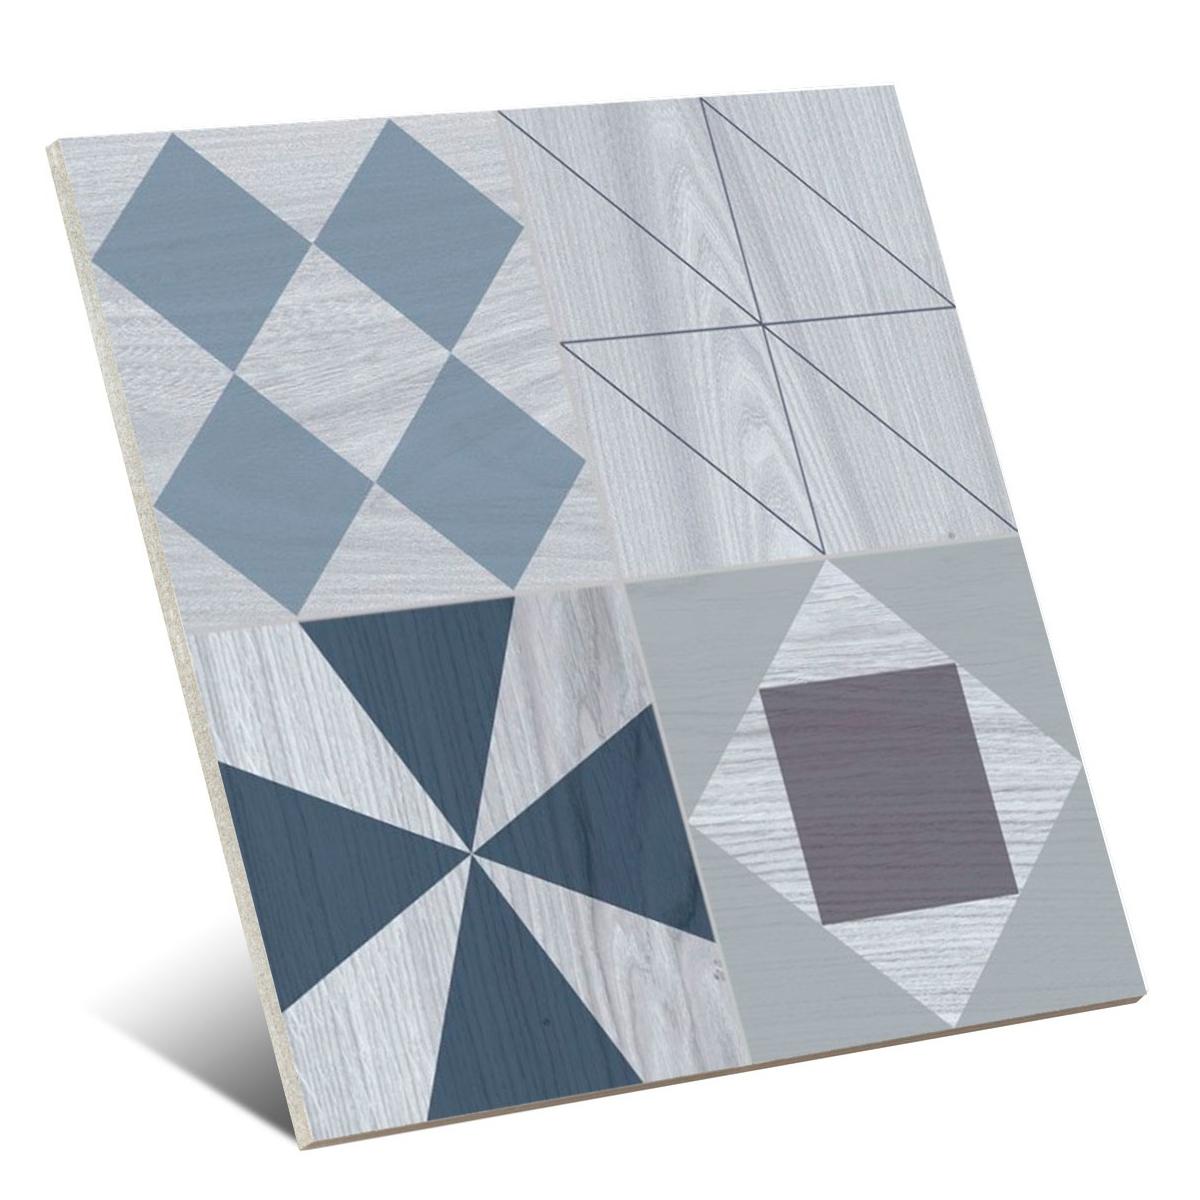 Kaleido blue (caja) - Colección Kaleido de Gaya Fores - Marca Gaya Fores S.L.